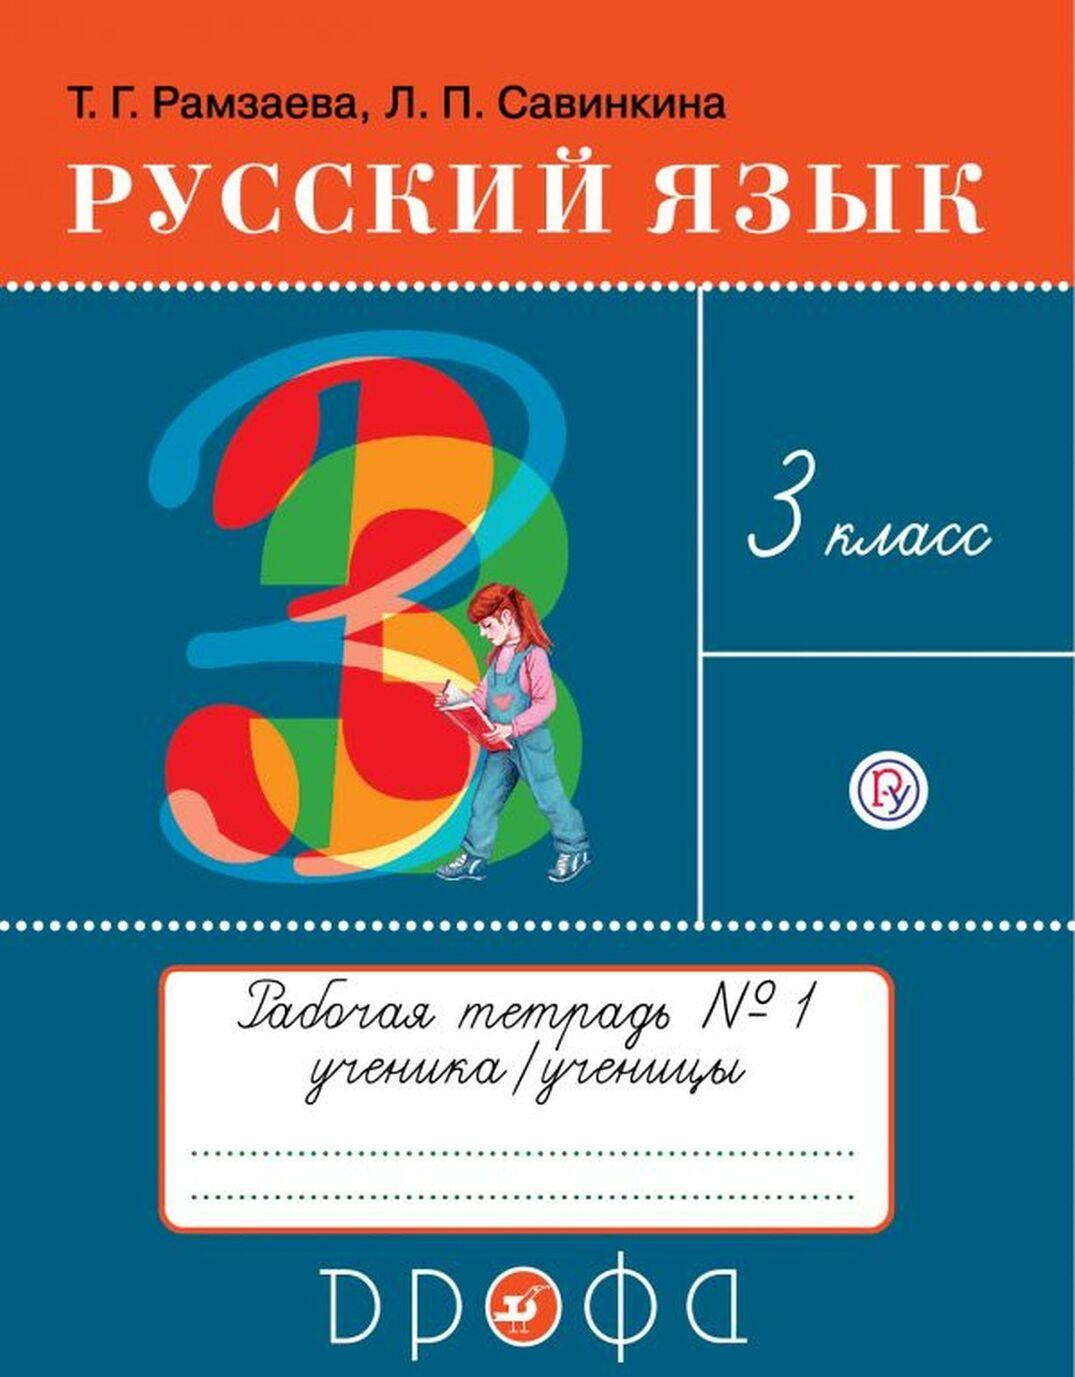 Russkij jazyk. 3 klass. Rabochaja tetrad. V 2-kh chastjakh. Chast 1 | Ramzaeva Tamara Grigorevna, Savinkina Ljudmila Pavlovna